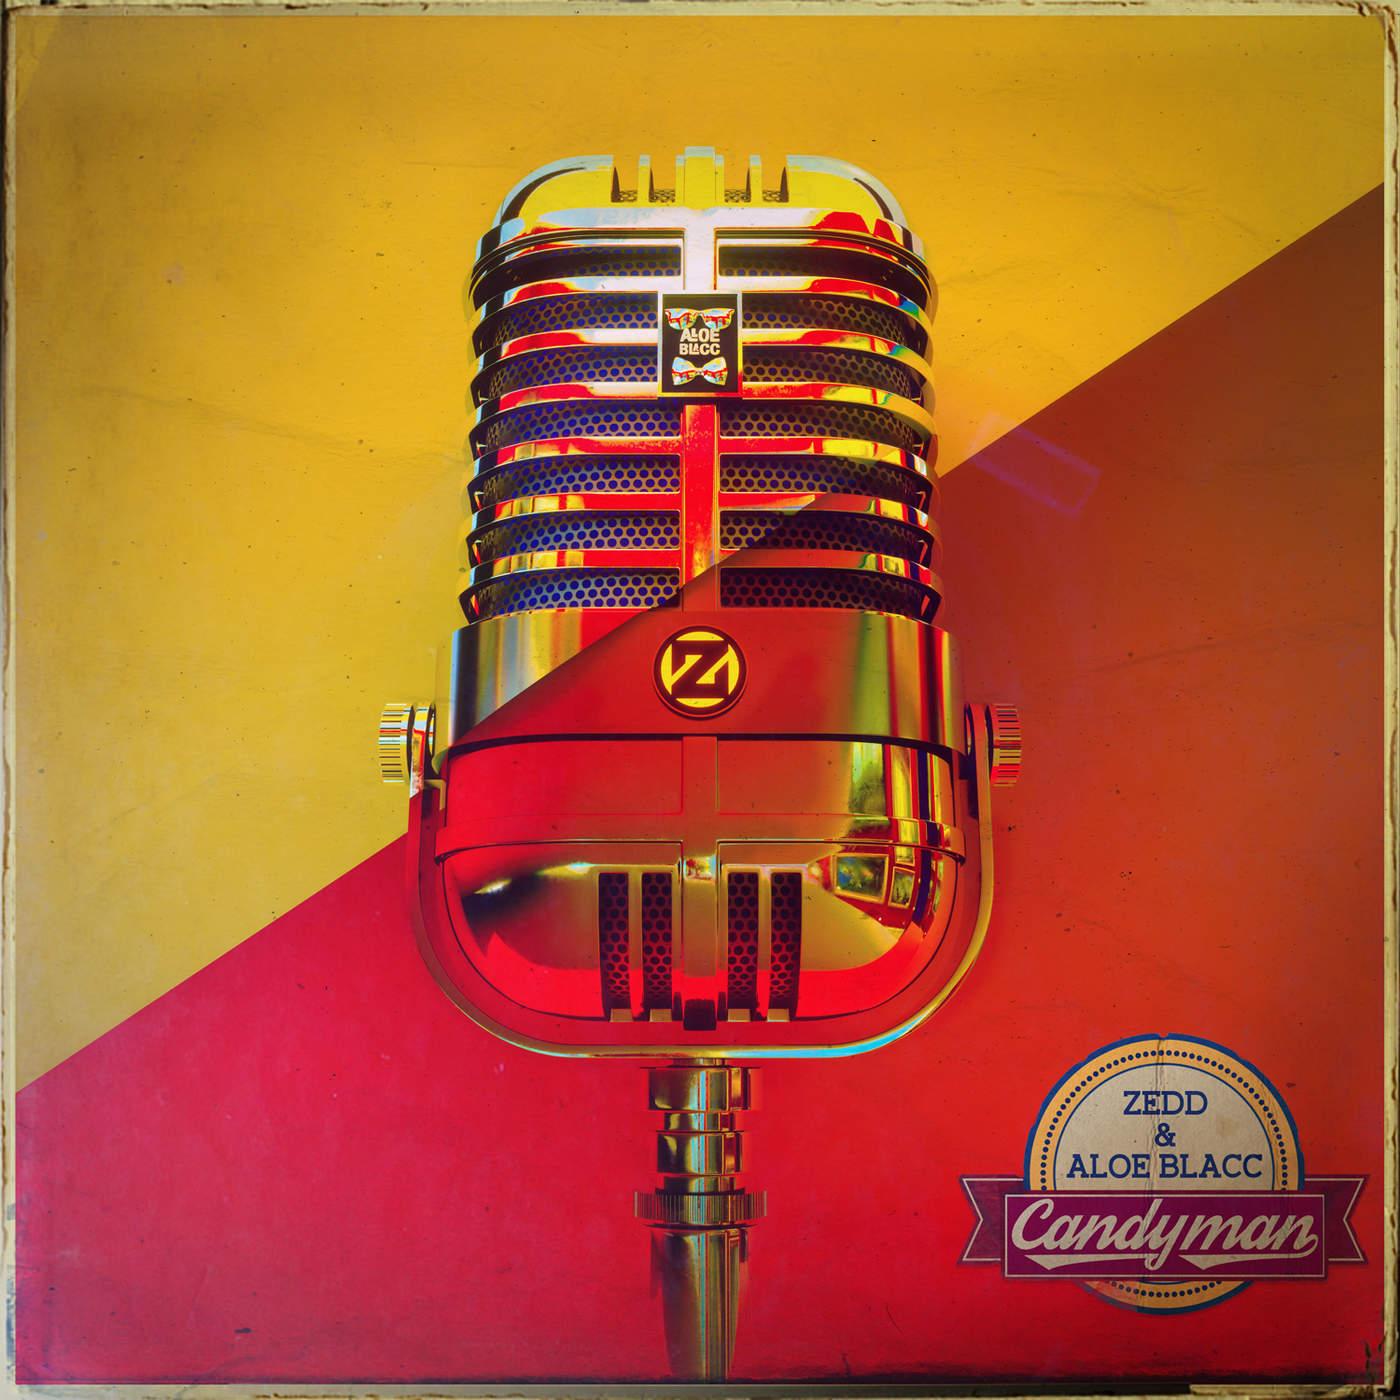 Zedd & Aloe Blacc – Candyman – Single Cover